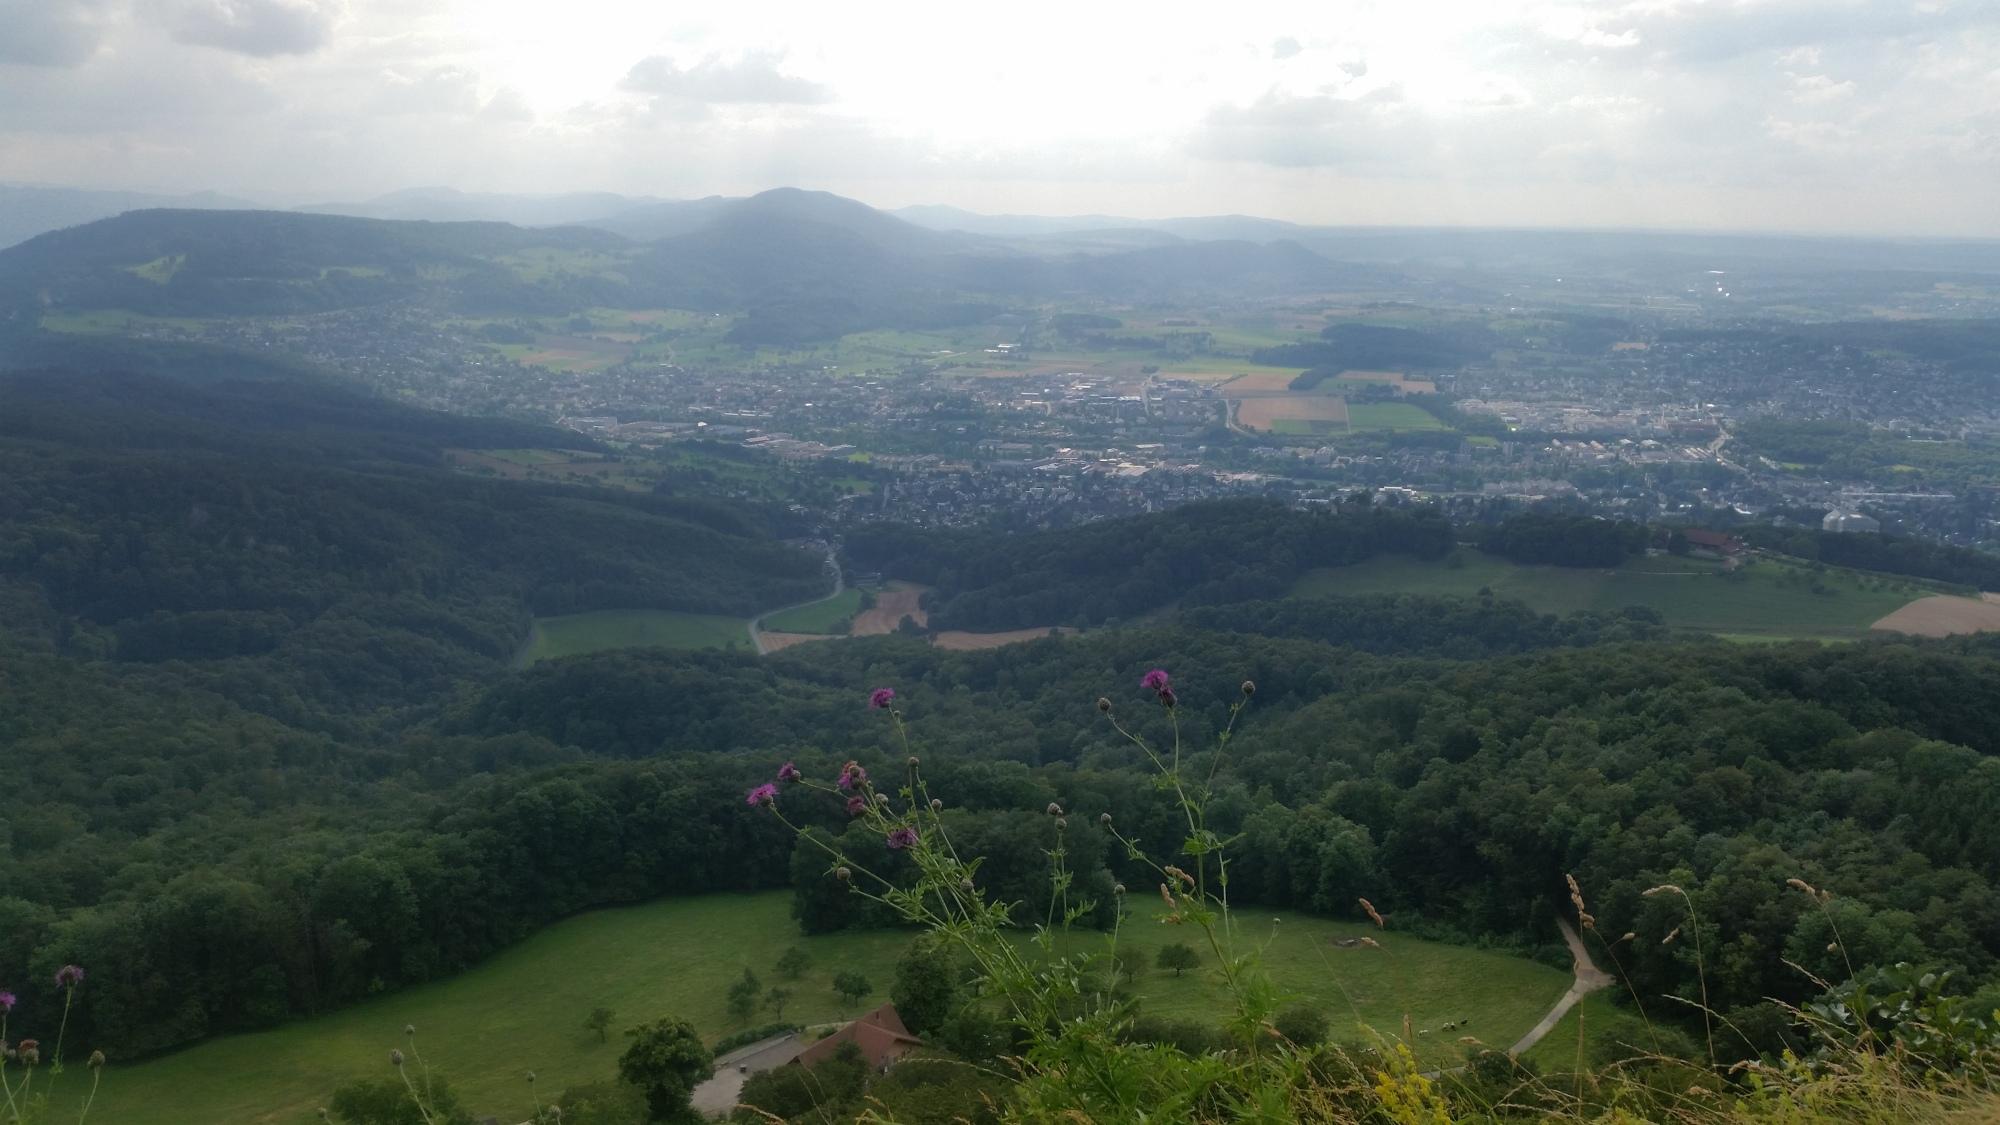 viewpoint gempen turm hochwald